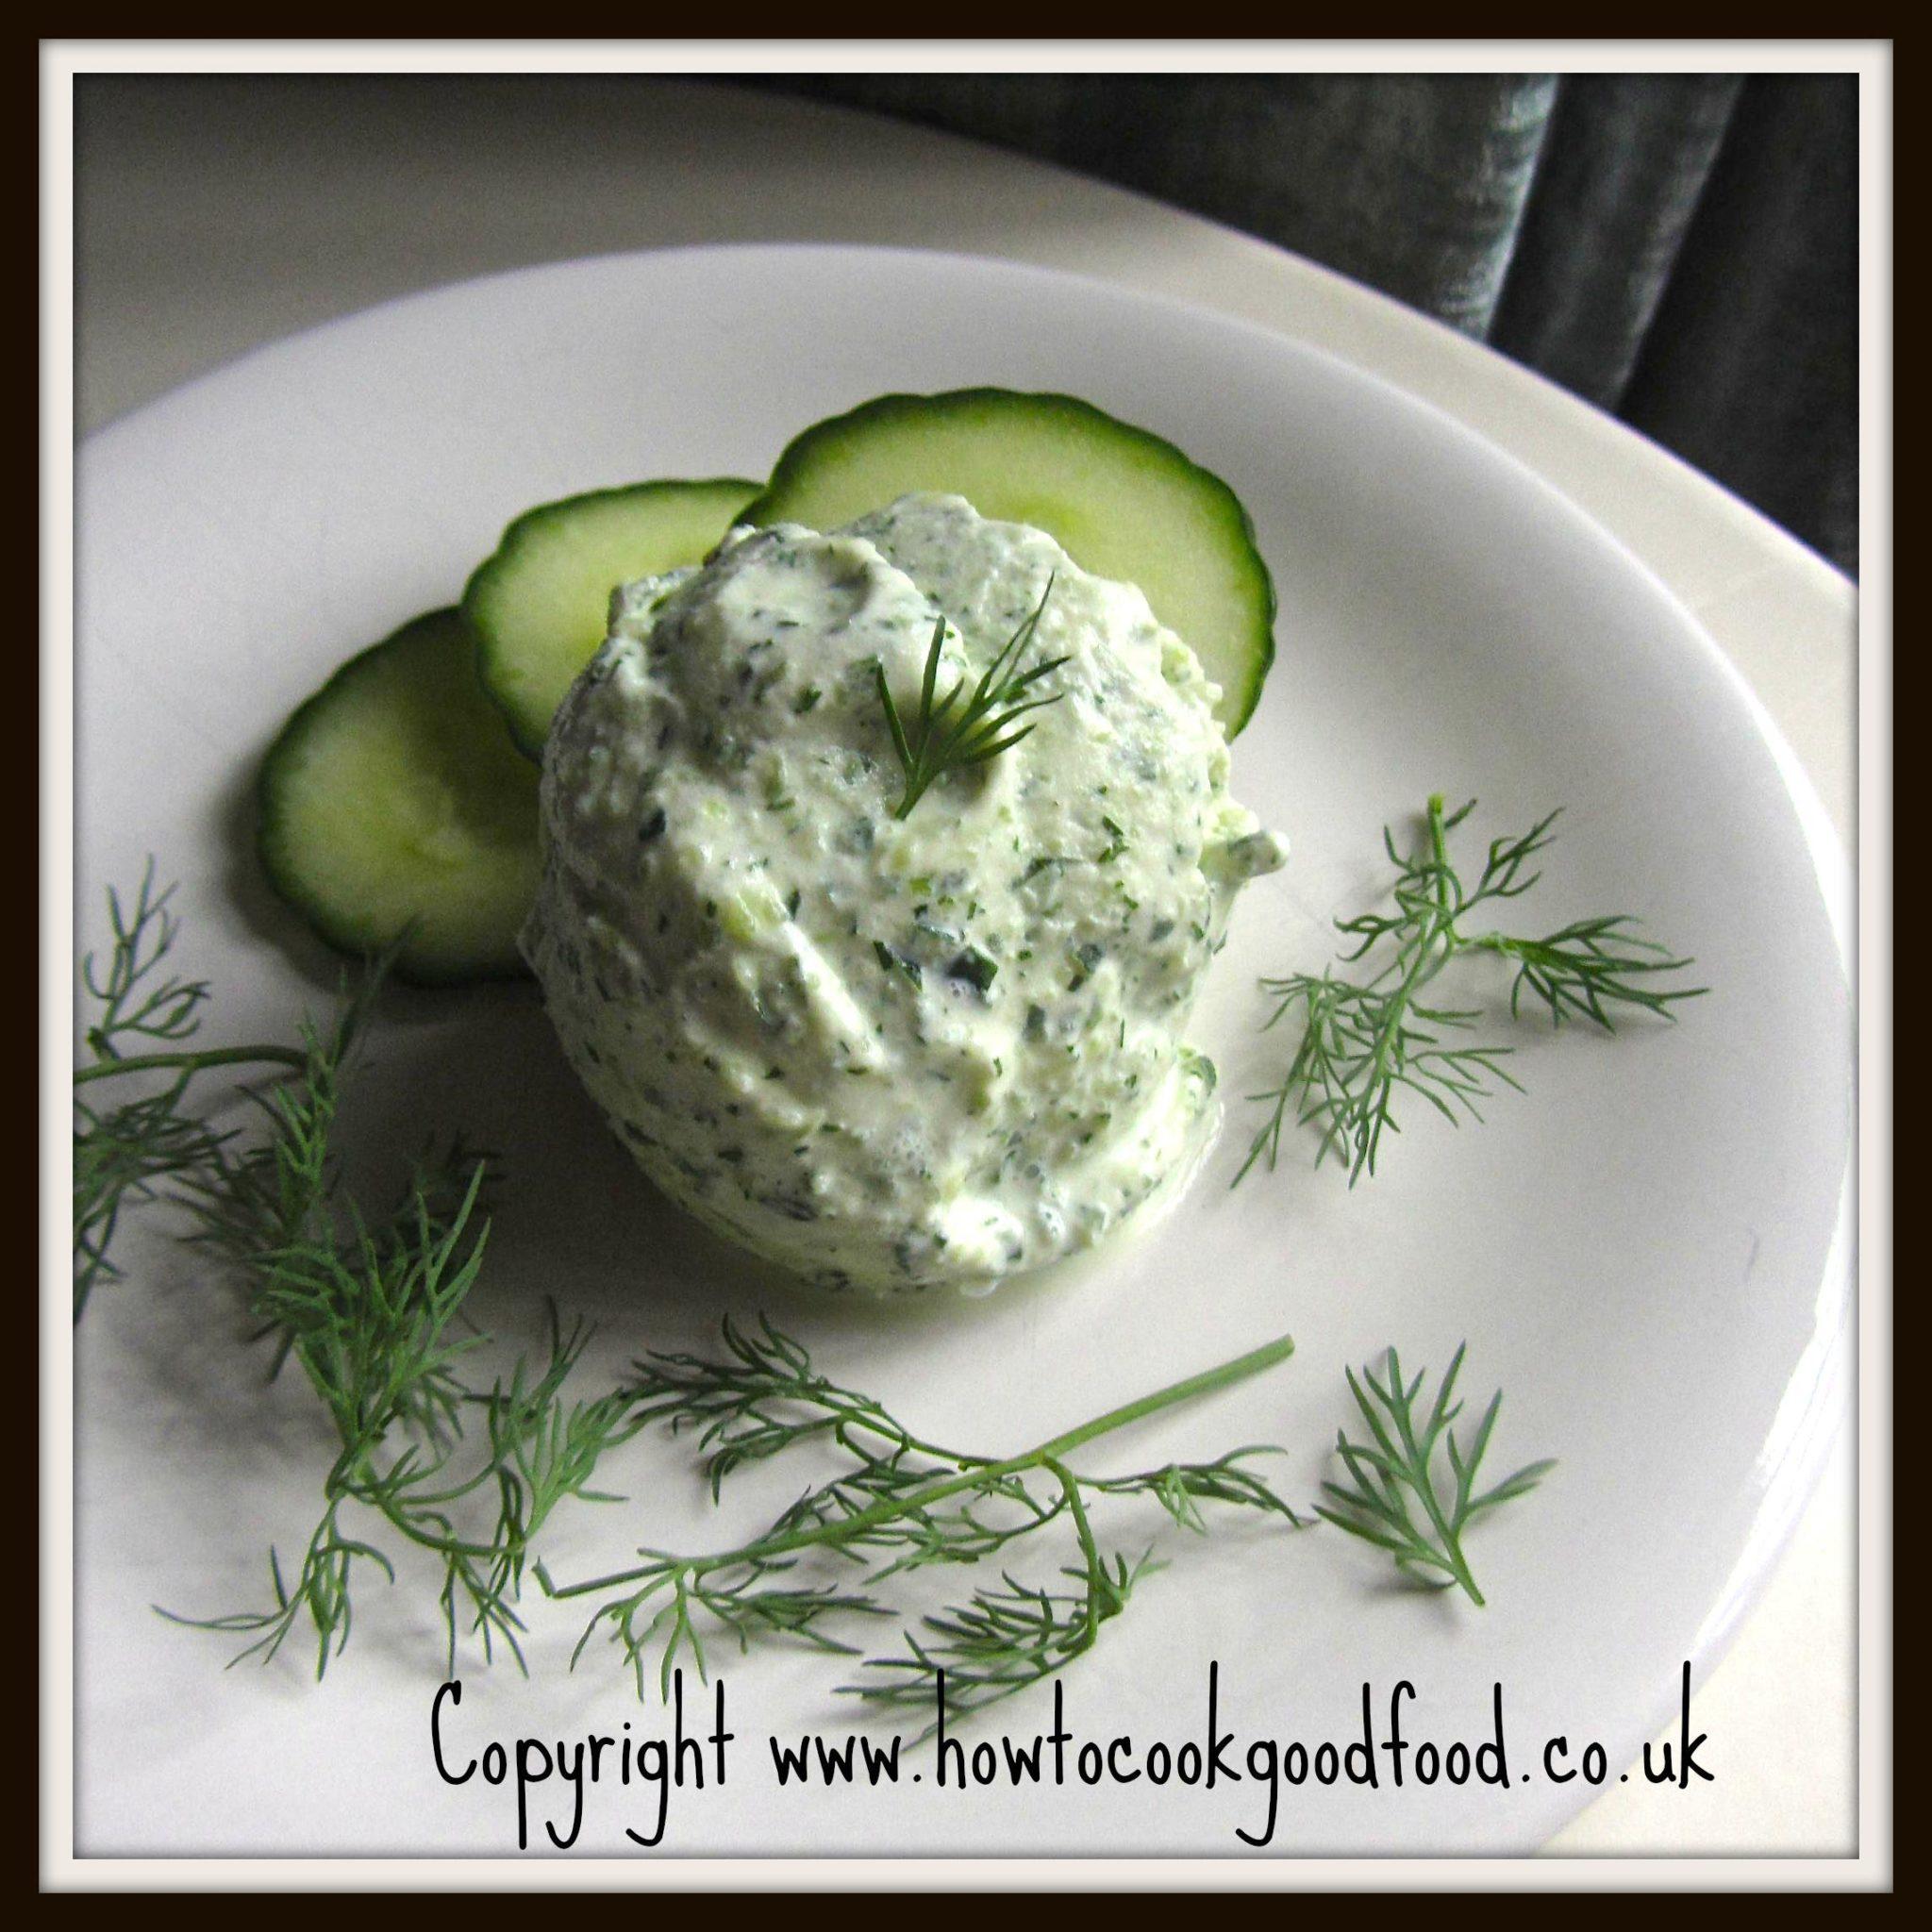 Cucumber & Dill Frozen Greek Yogurt